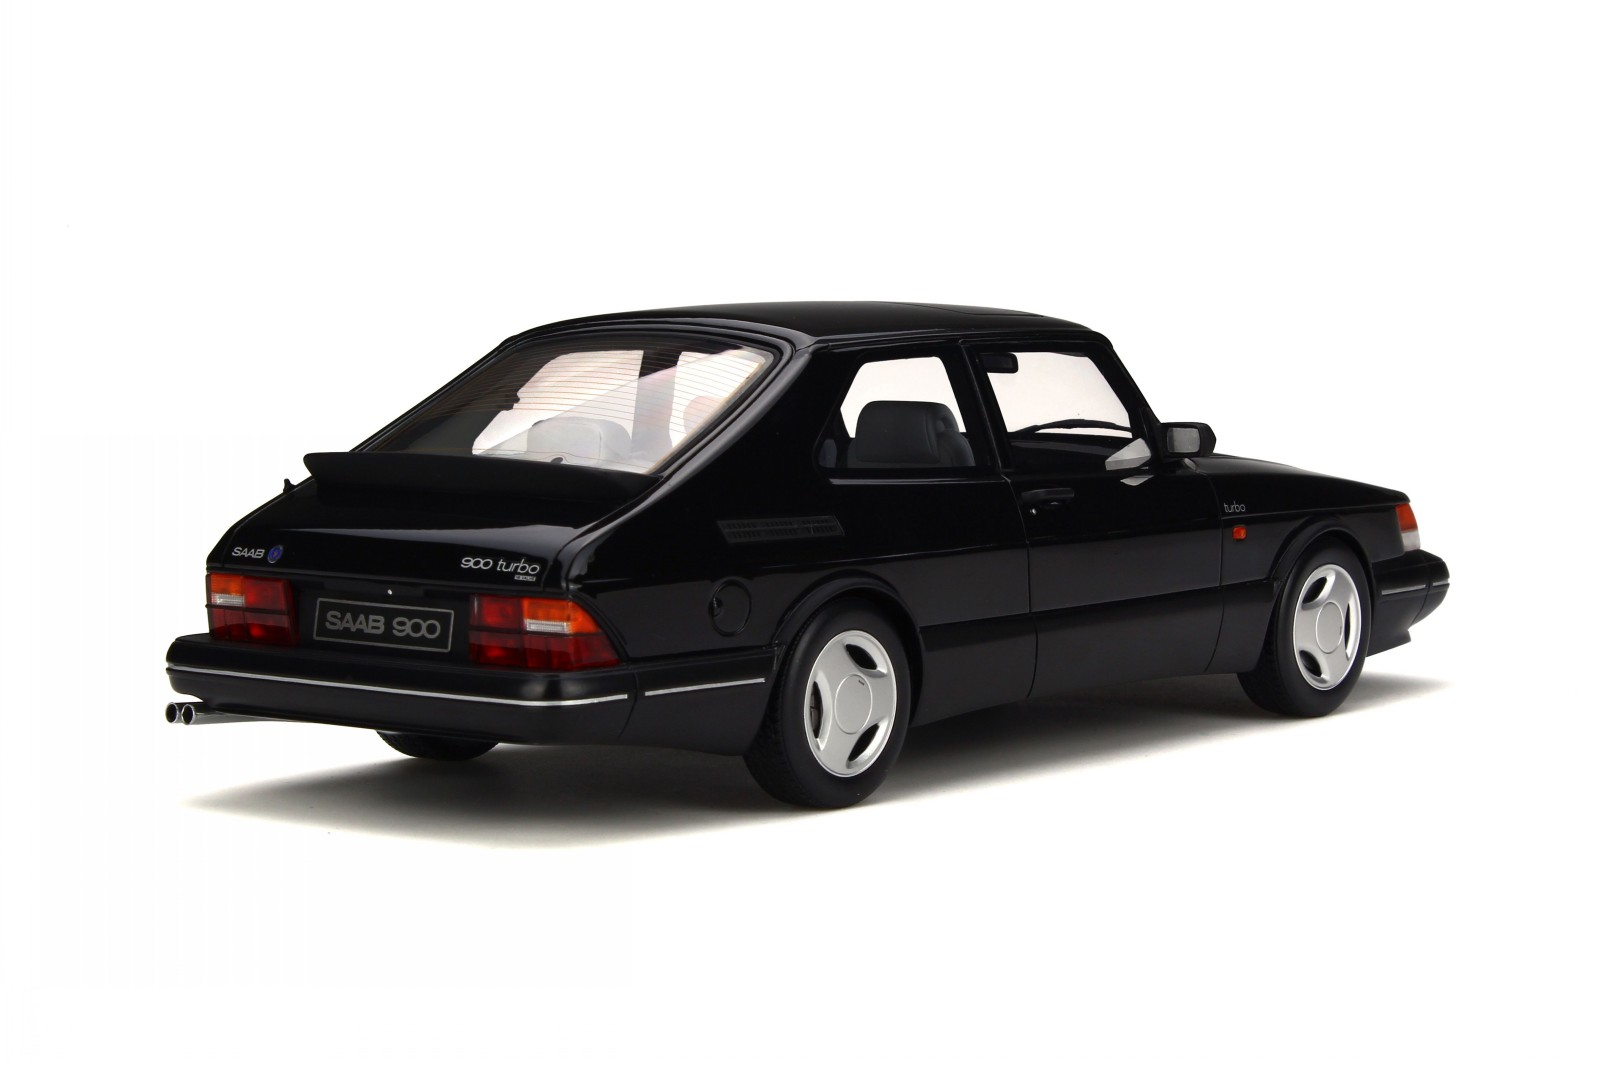 Saab-900-Turbo-Phase-1-black-resin-modelcar-OT678-Otto-1-18 thumbnail 2